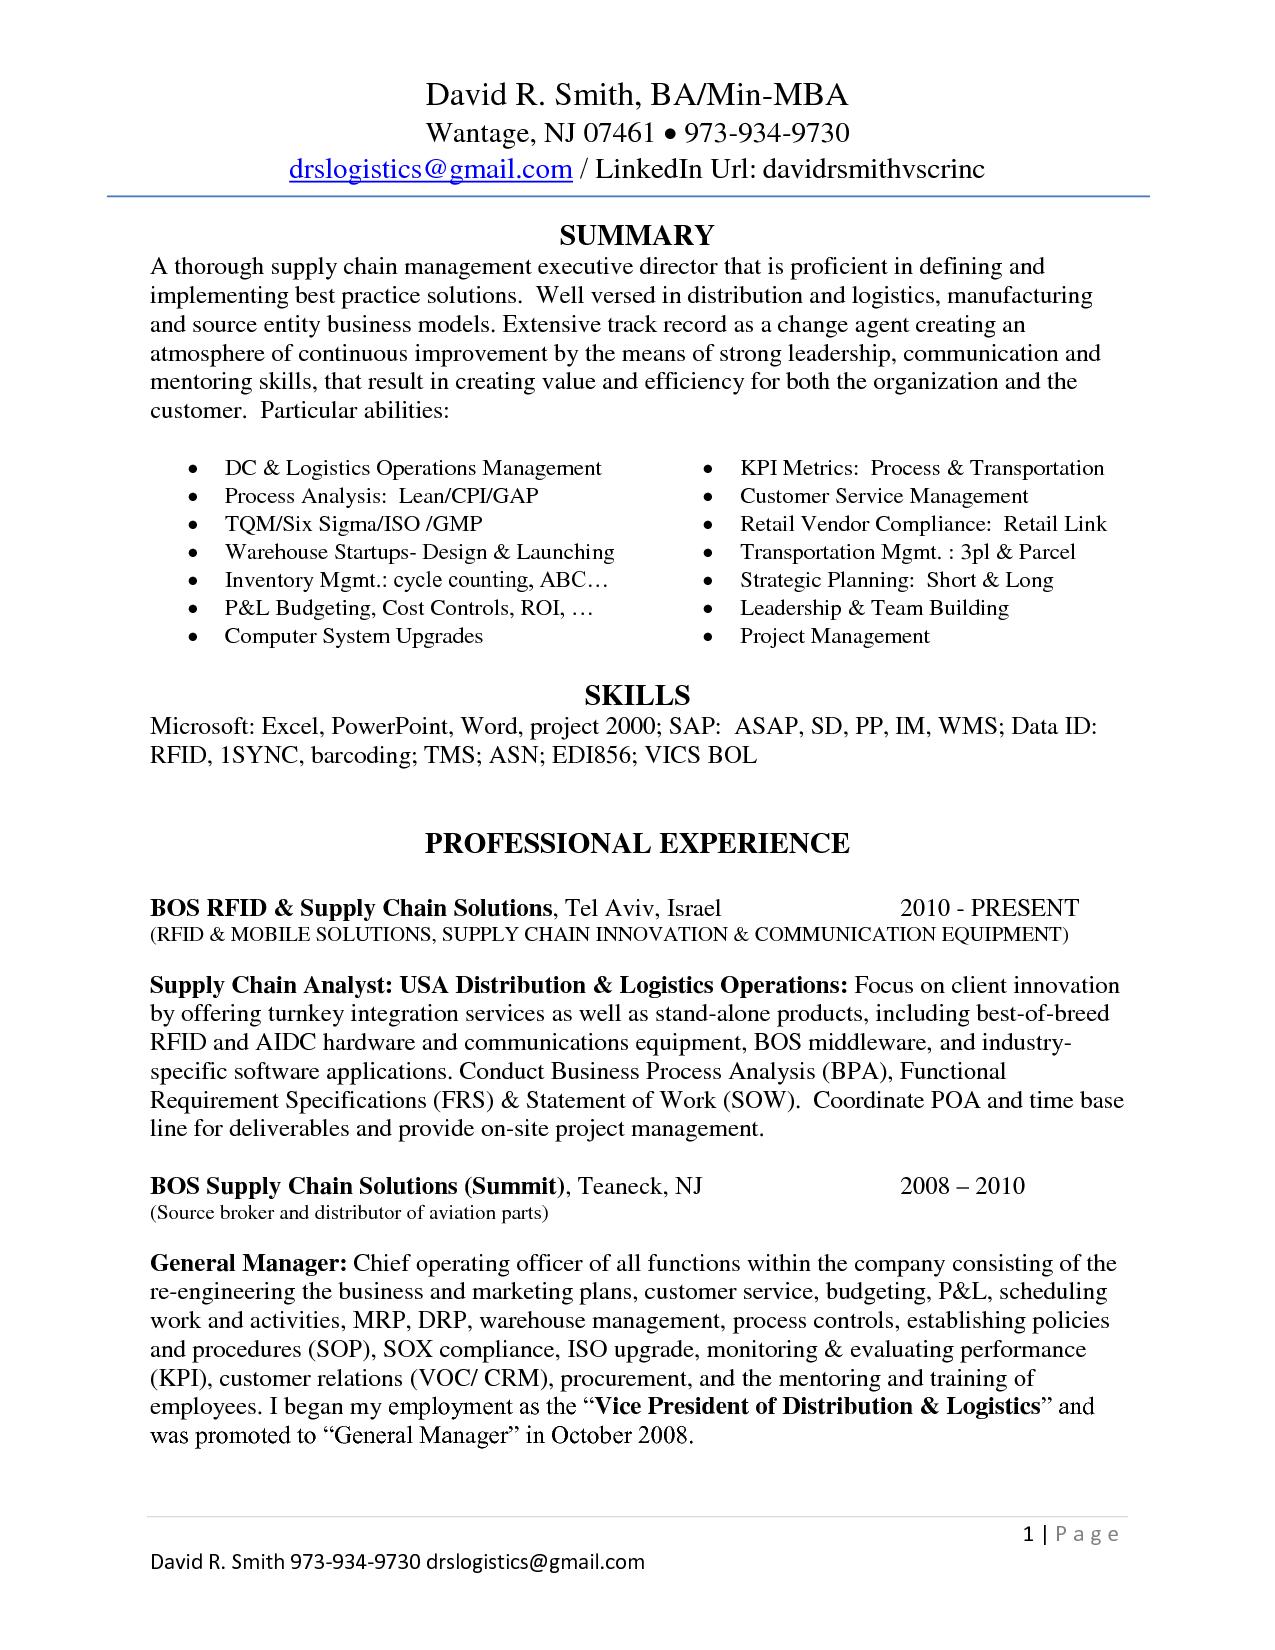 Linkedin Resume examples, Good resume examples, Resume